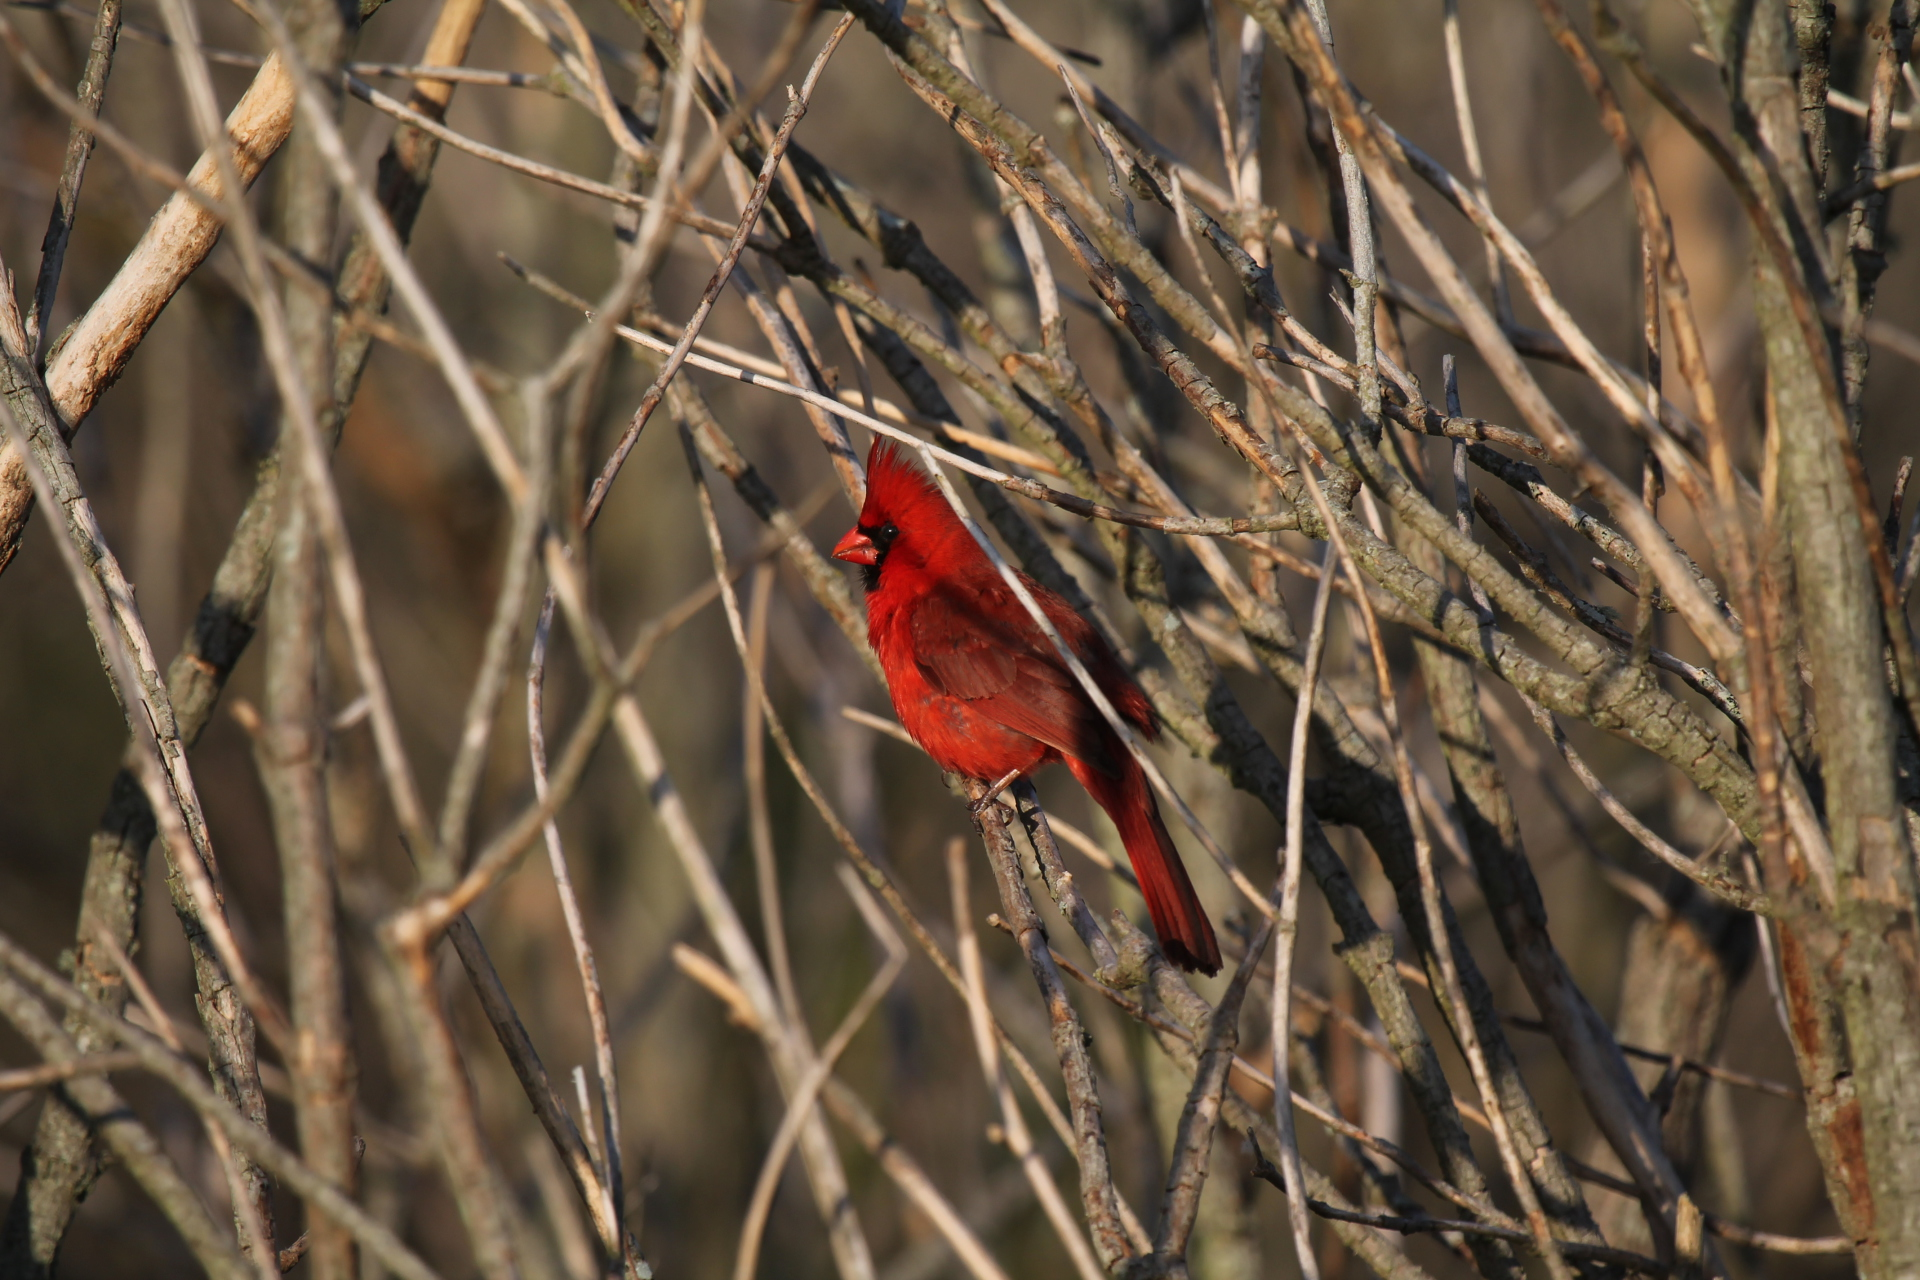 Northern Cardinals Color the Landscape